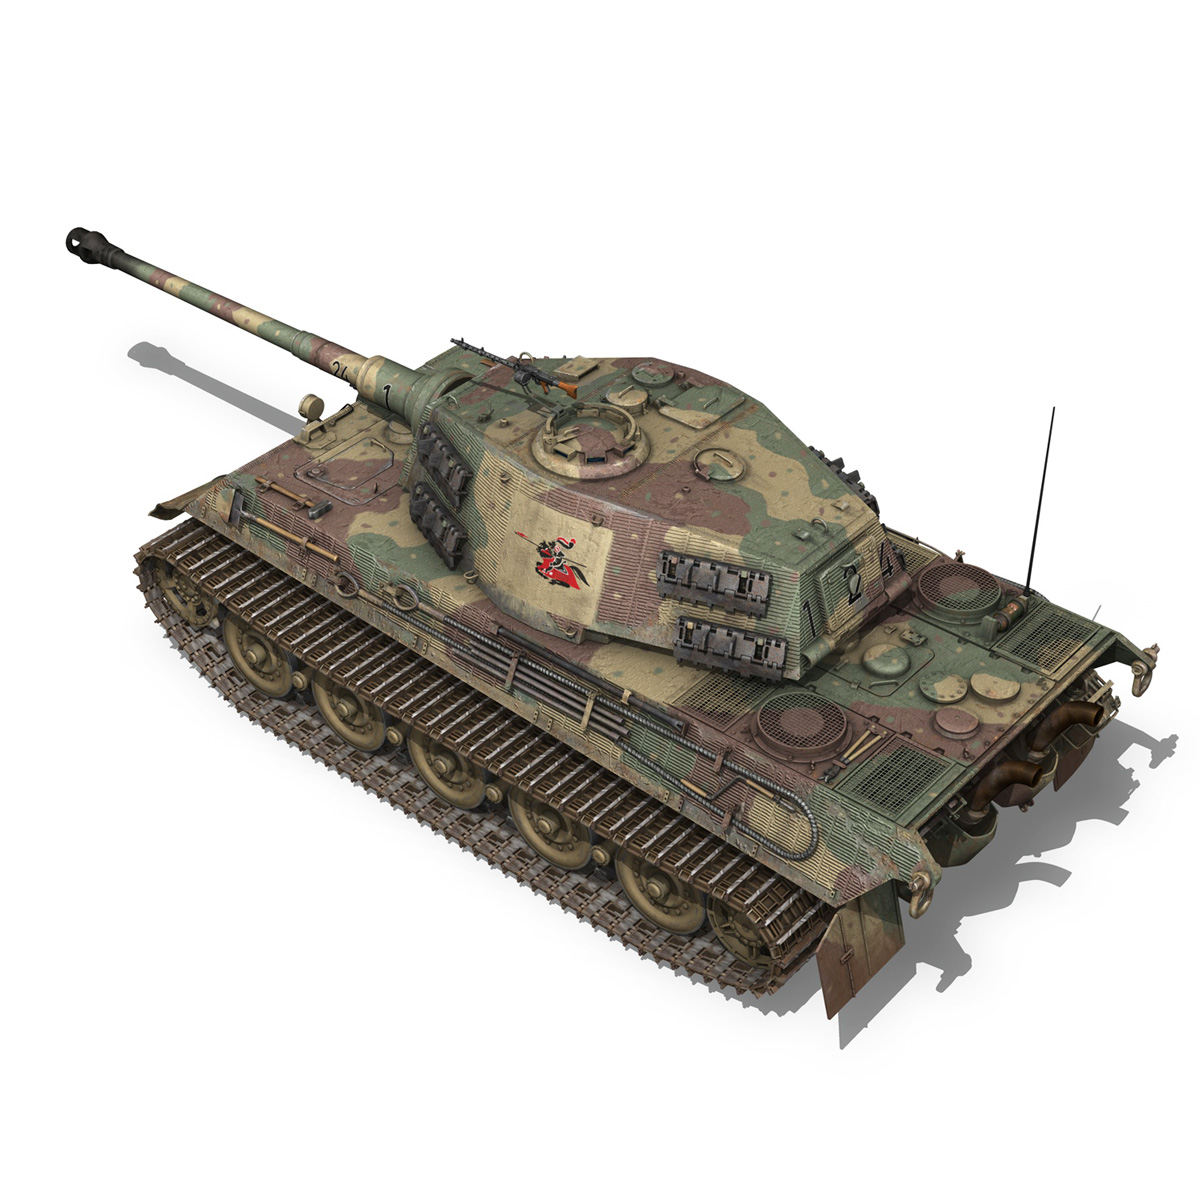 Panzerkampfwagen VI - Ausf B - Tiger II - 124 3d model 3ds c4d lwo lws lw obj 273758